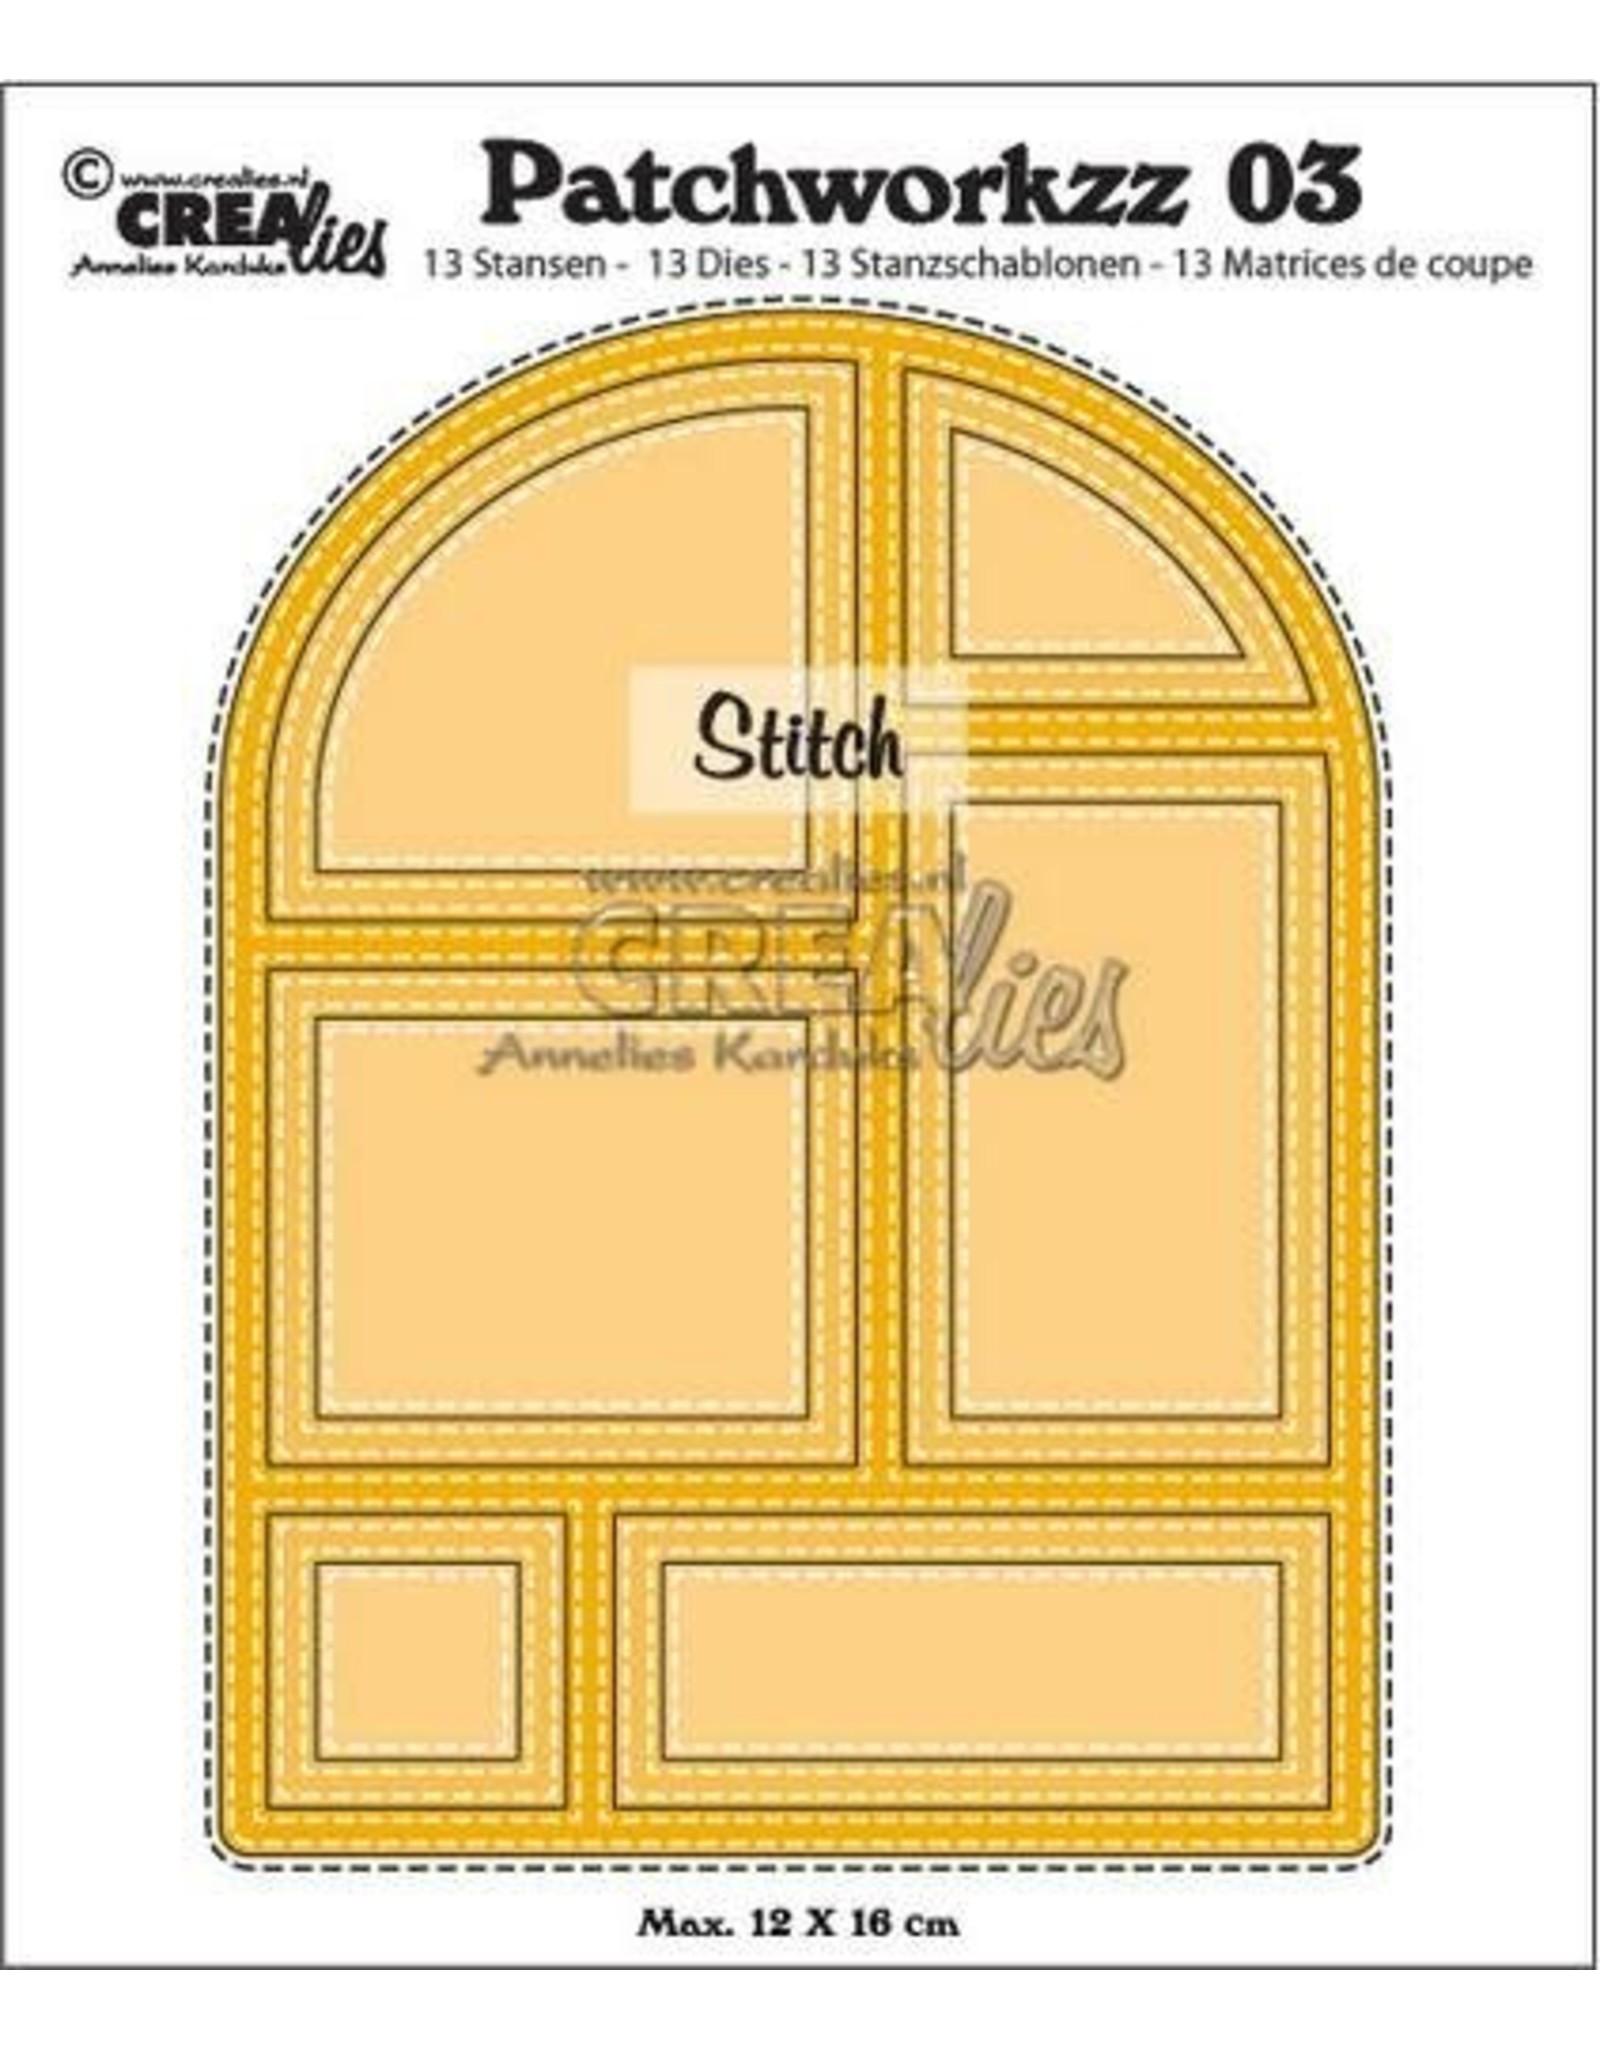 Crealies Crealies Modern Patchwork no.3 stiklijn boog CLPW03 max. 12 x 16 cm